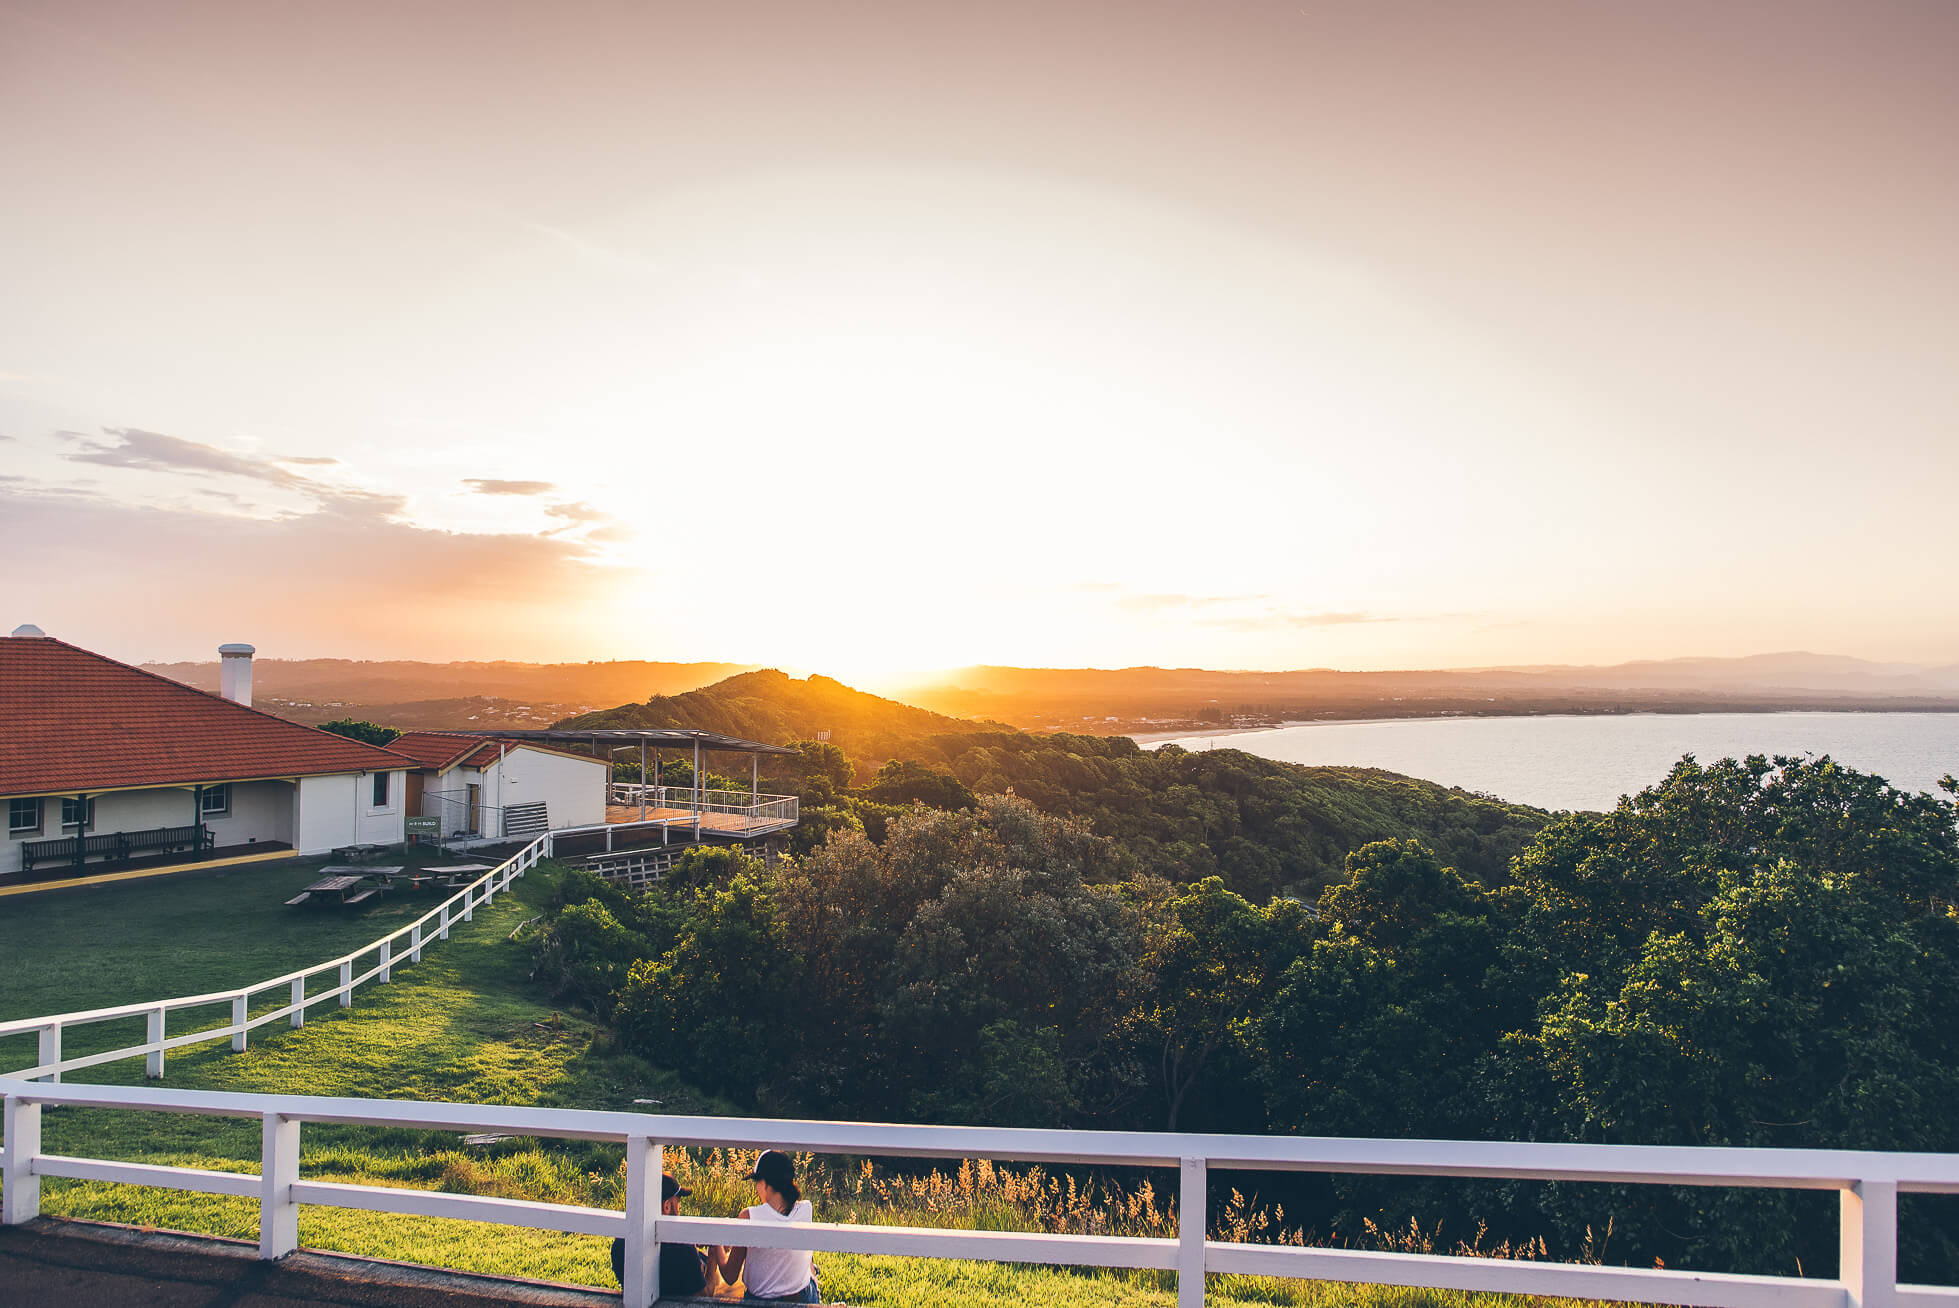 janni-deler-sunset-moment-byronbayDSC_3961